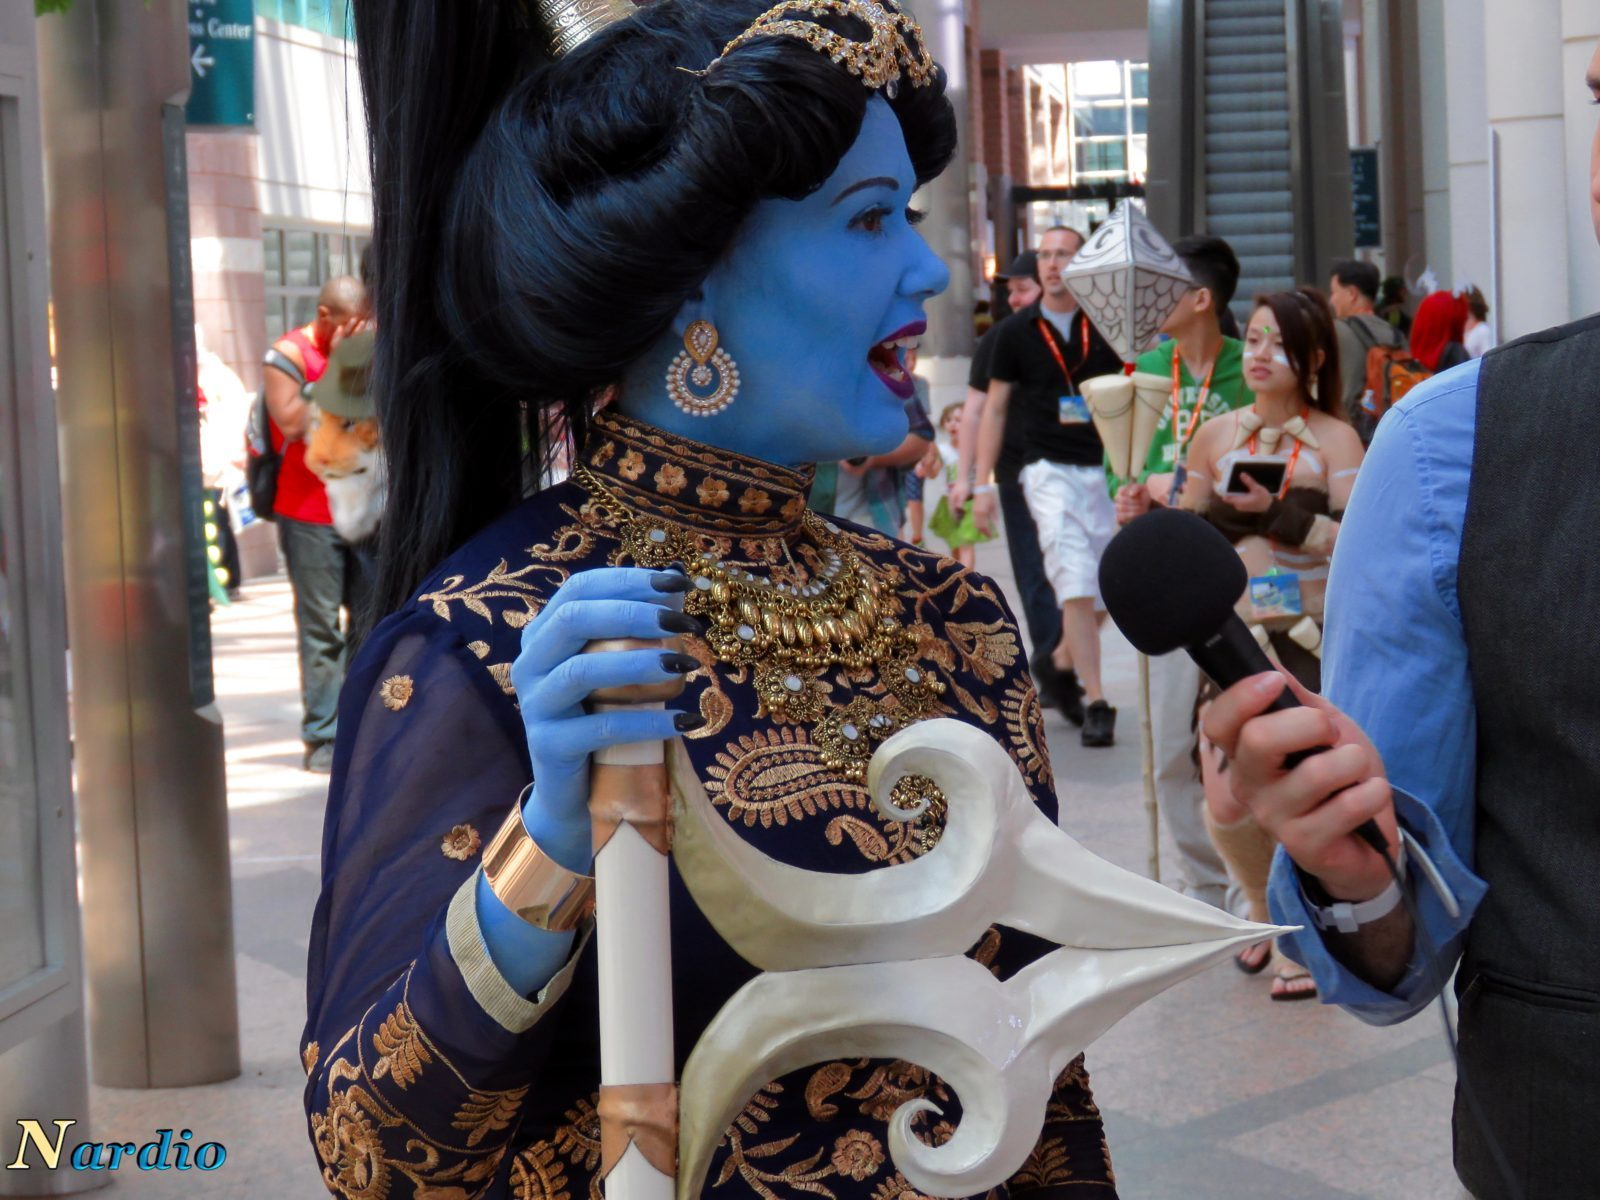 Aladdin and Genie AnimeNext Cosplay Sword top